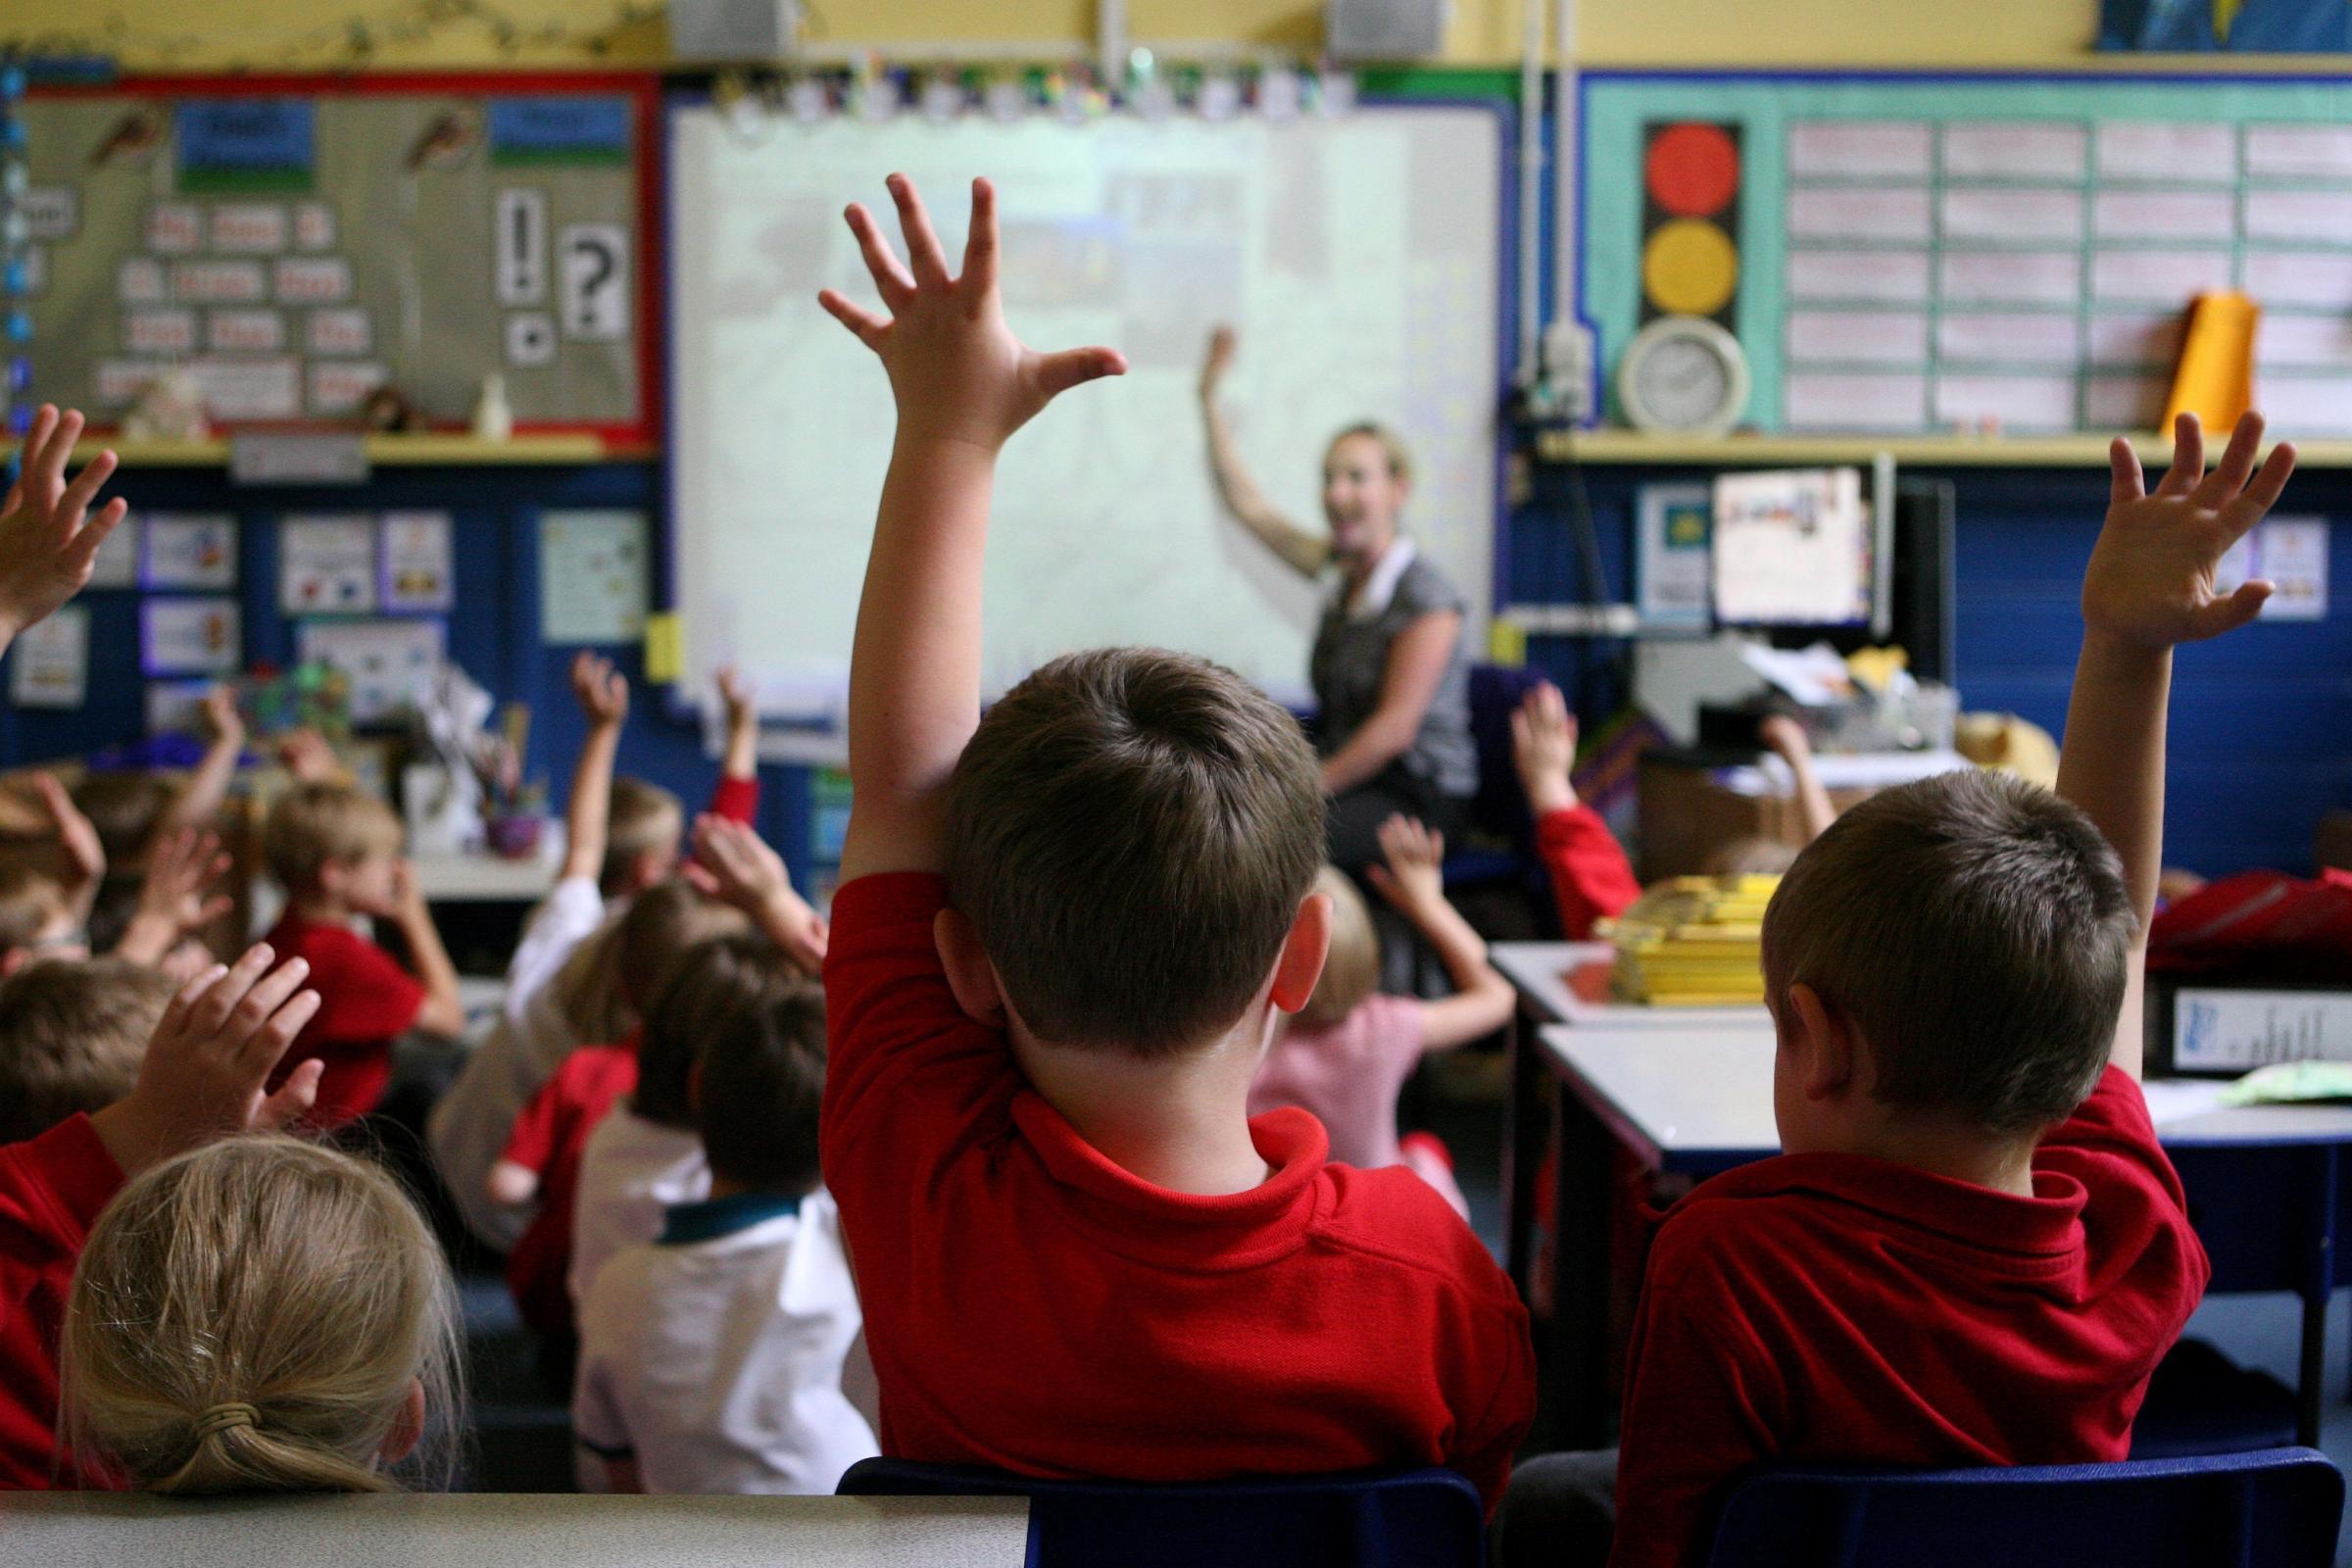 Action vowed to increase minority ethnic teachers in Scottish schools